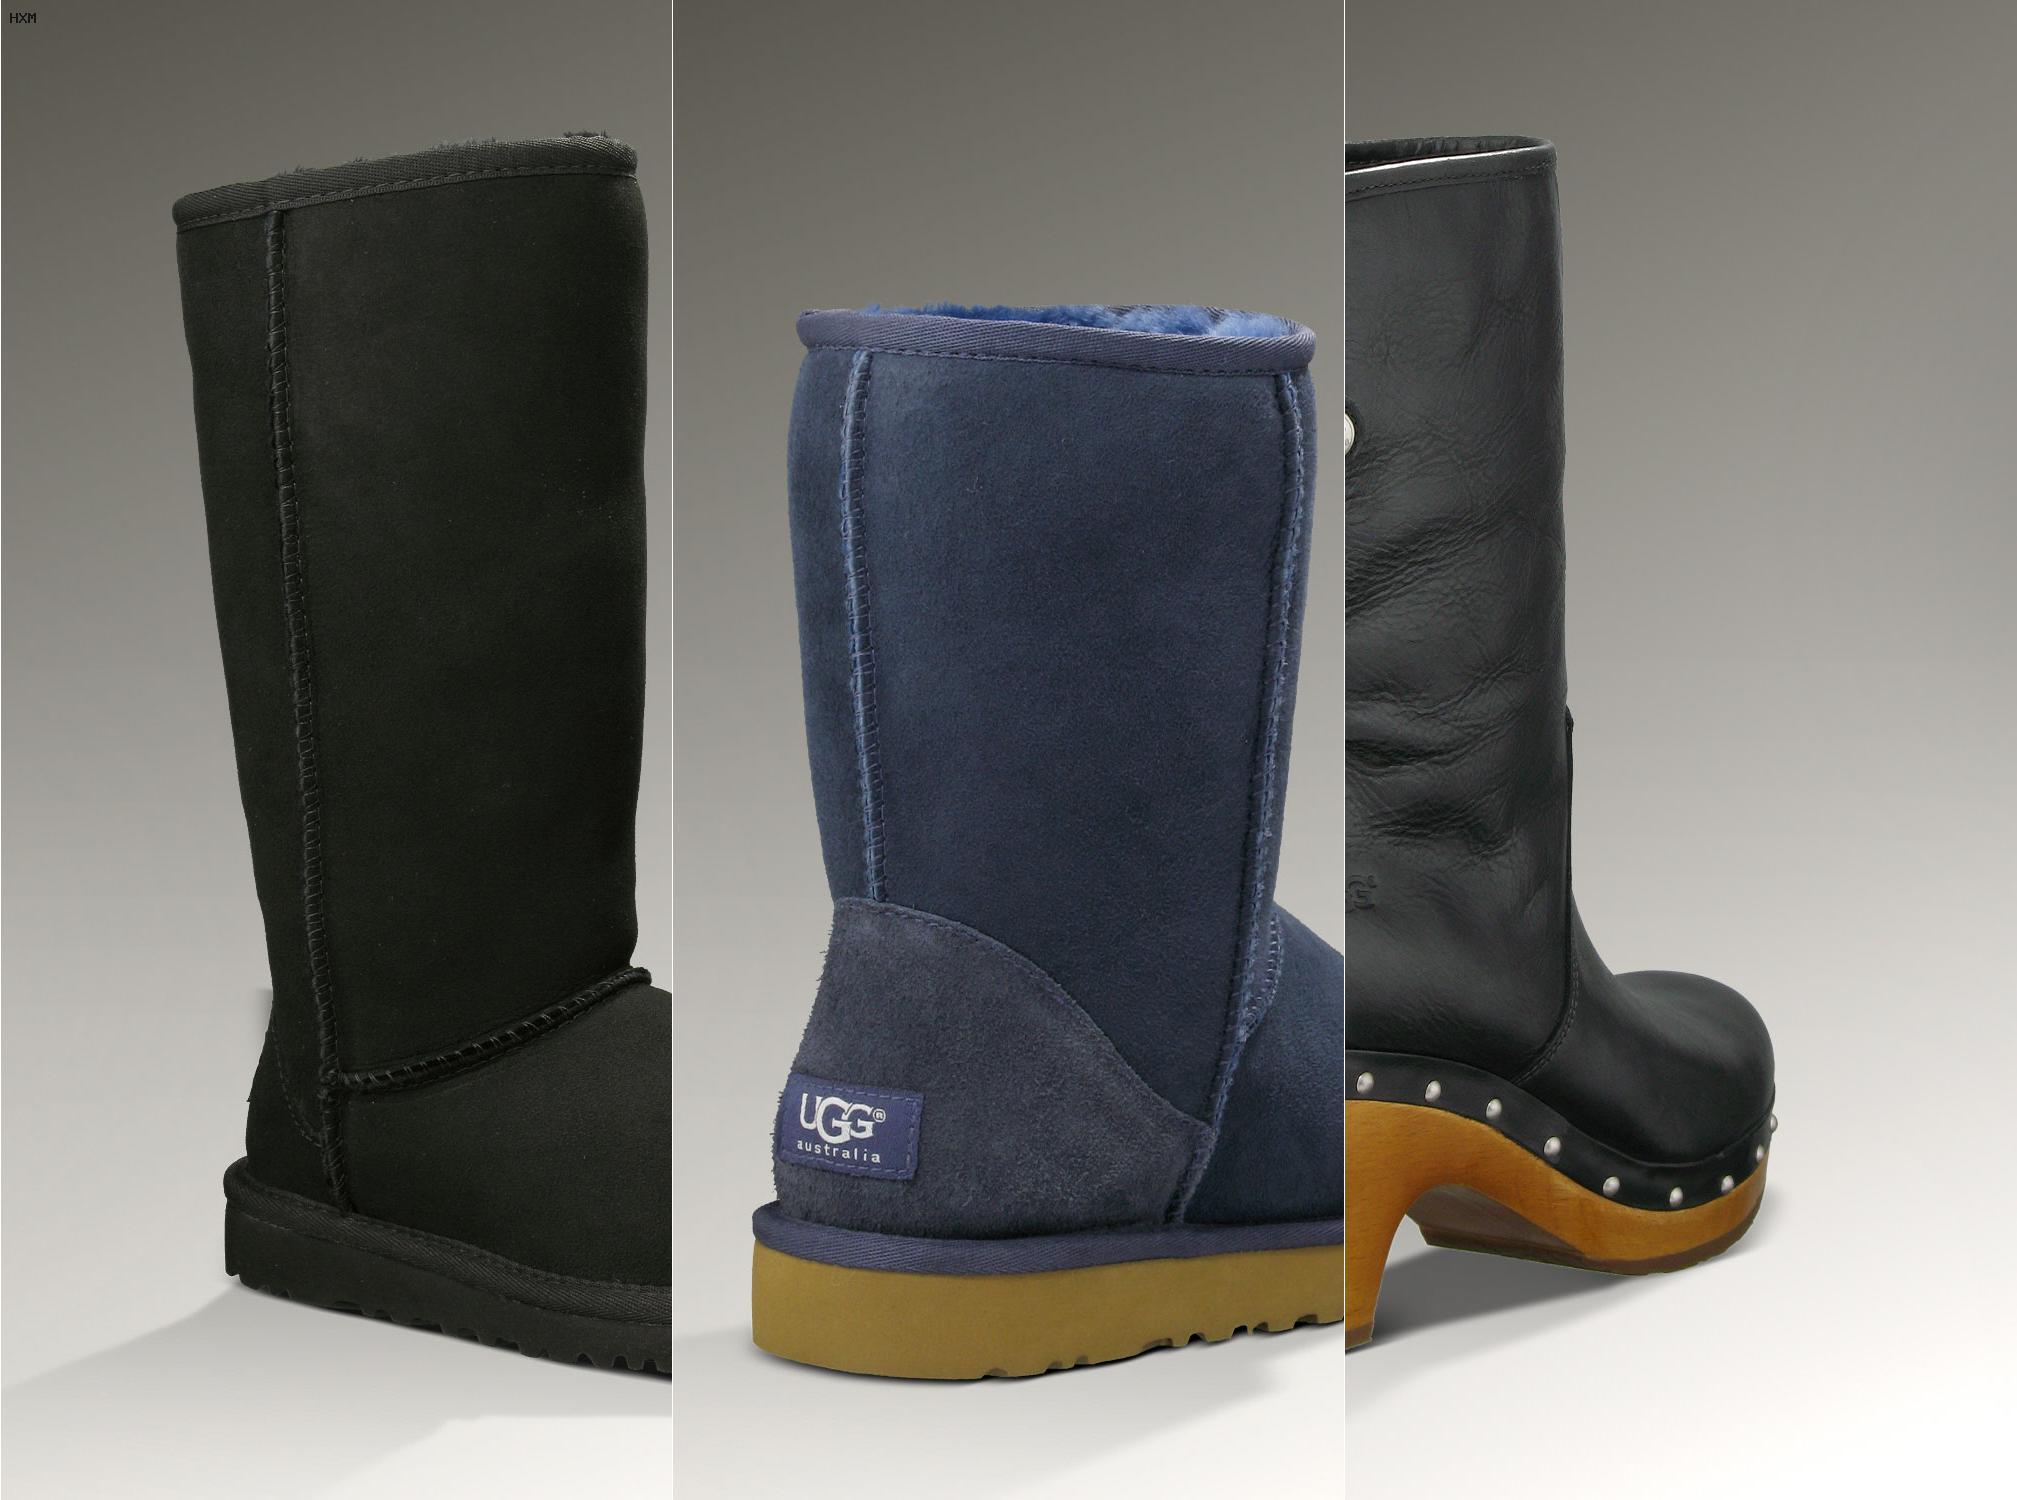 marca ugg boots